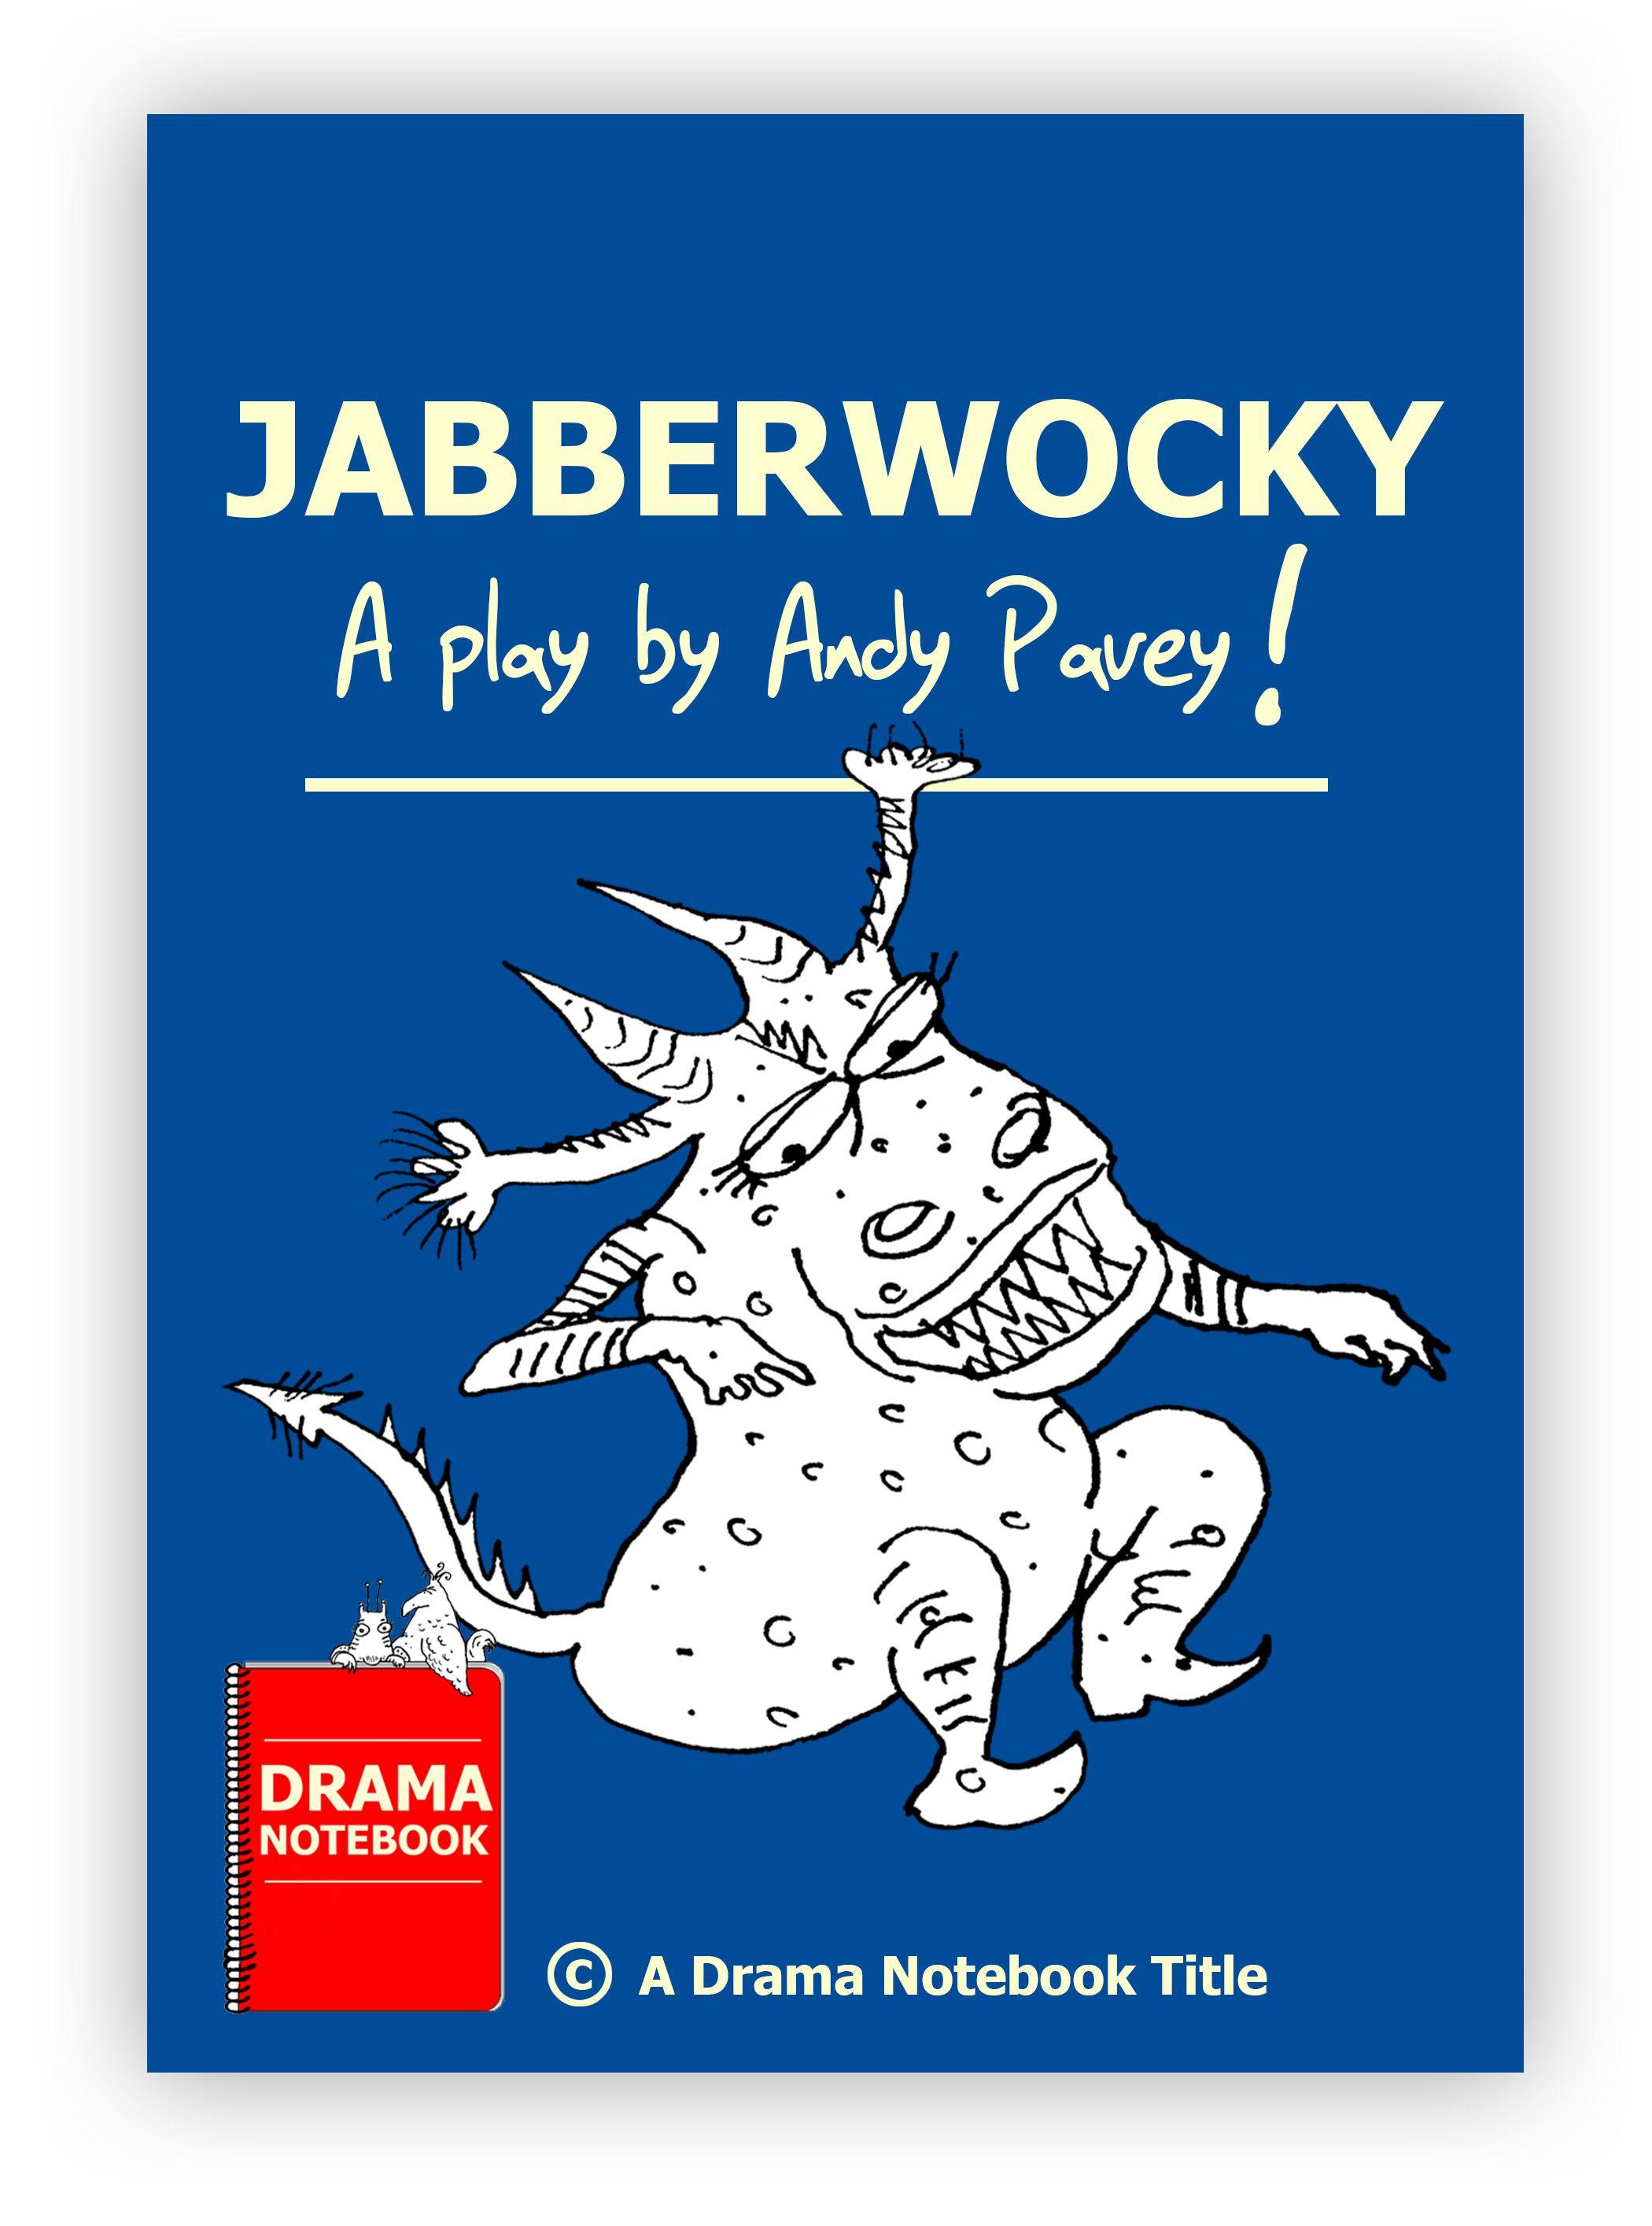 410 Scripts And Plays For Kids Ideas Teaching Drama Drama Class Drama Ideas